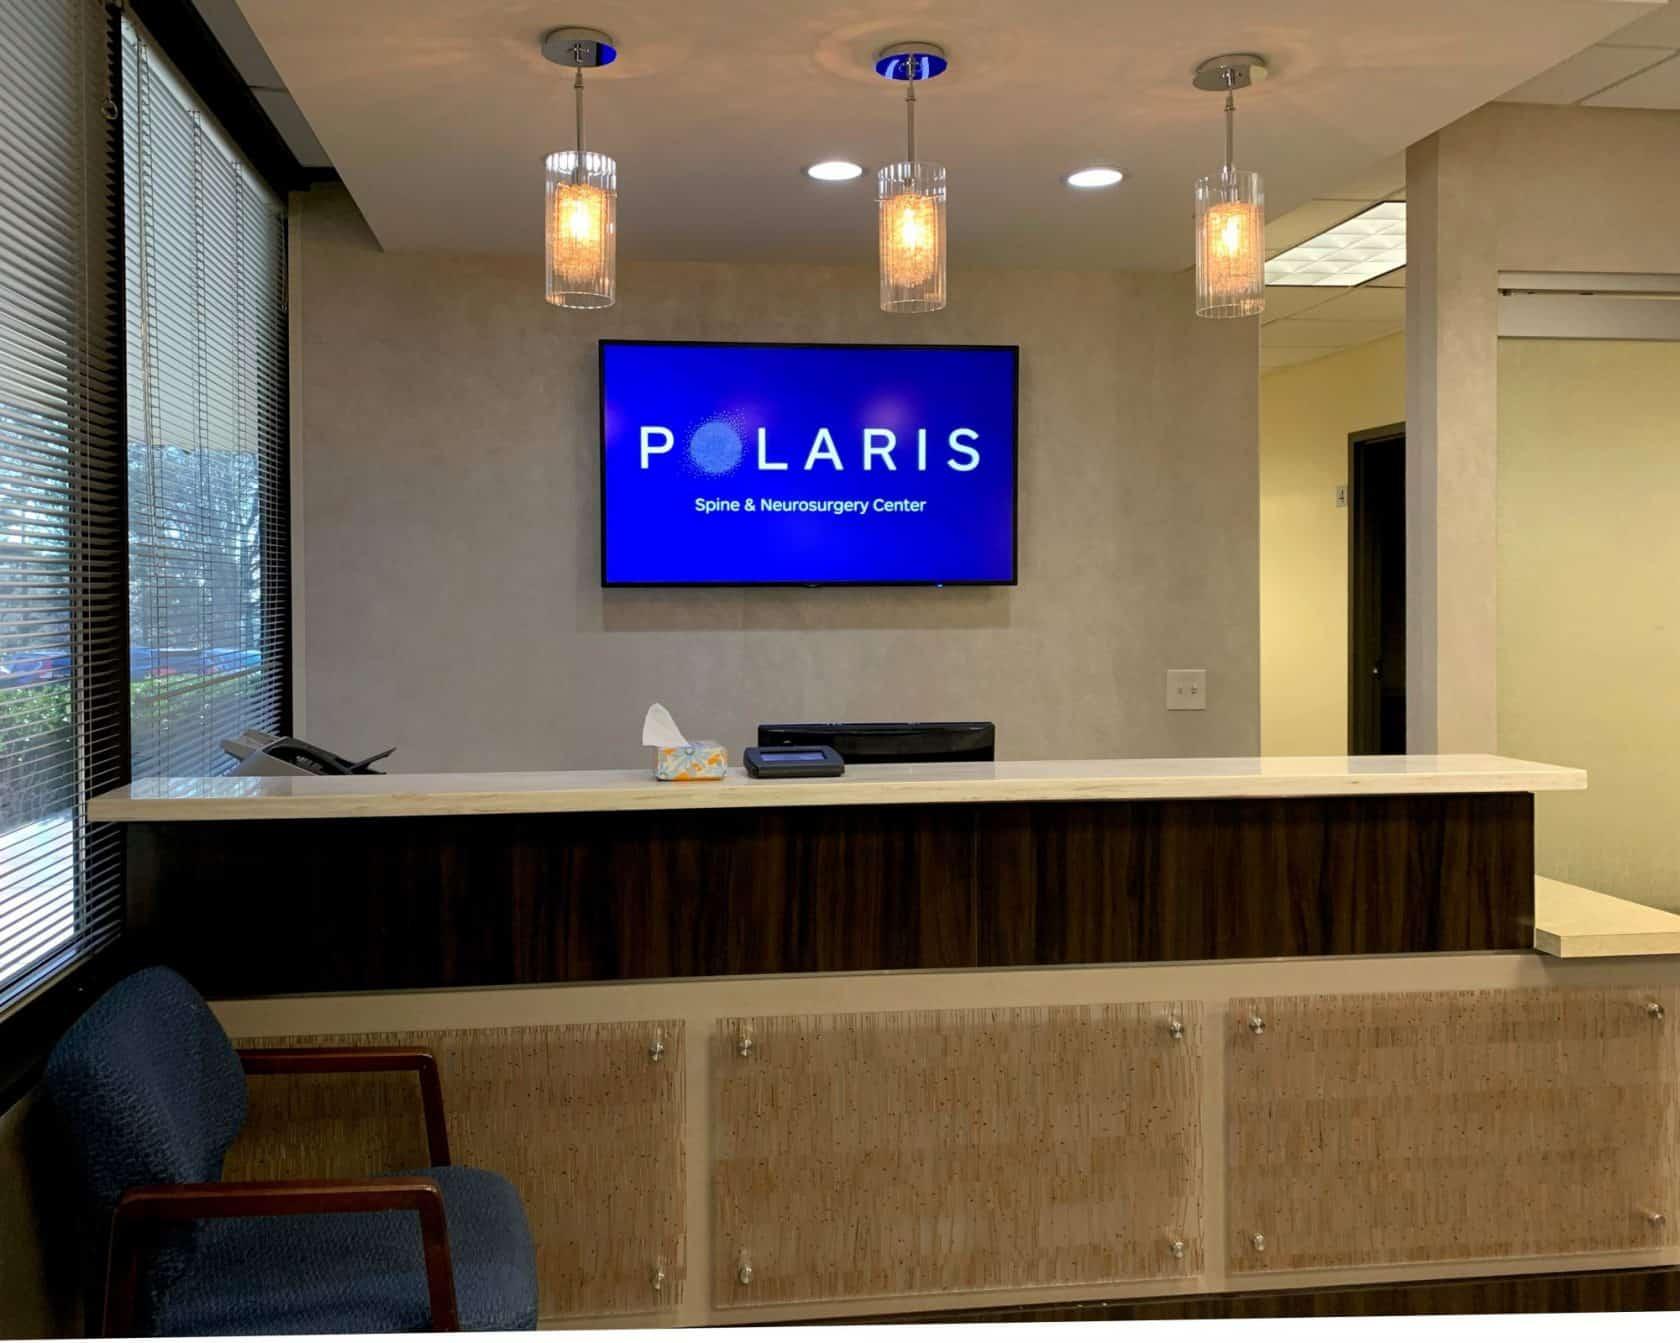 Polaris Spine & Neurosurgery Center patient waiting room